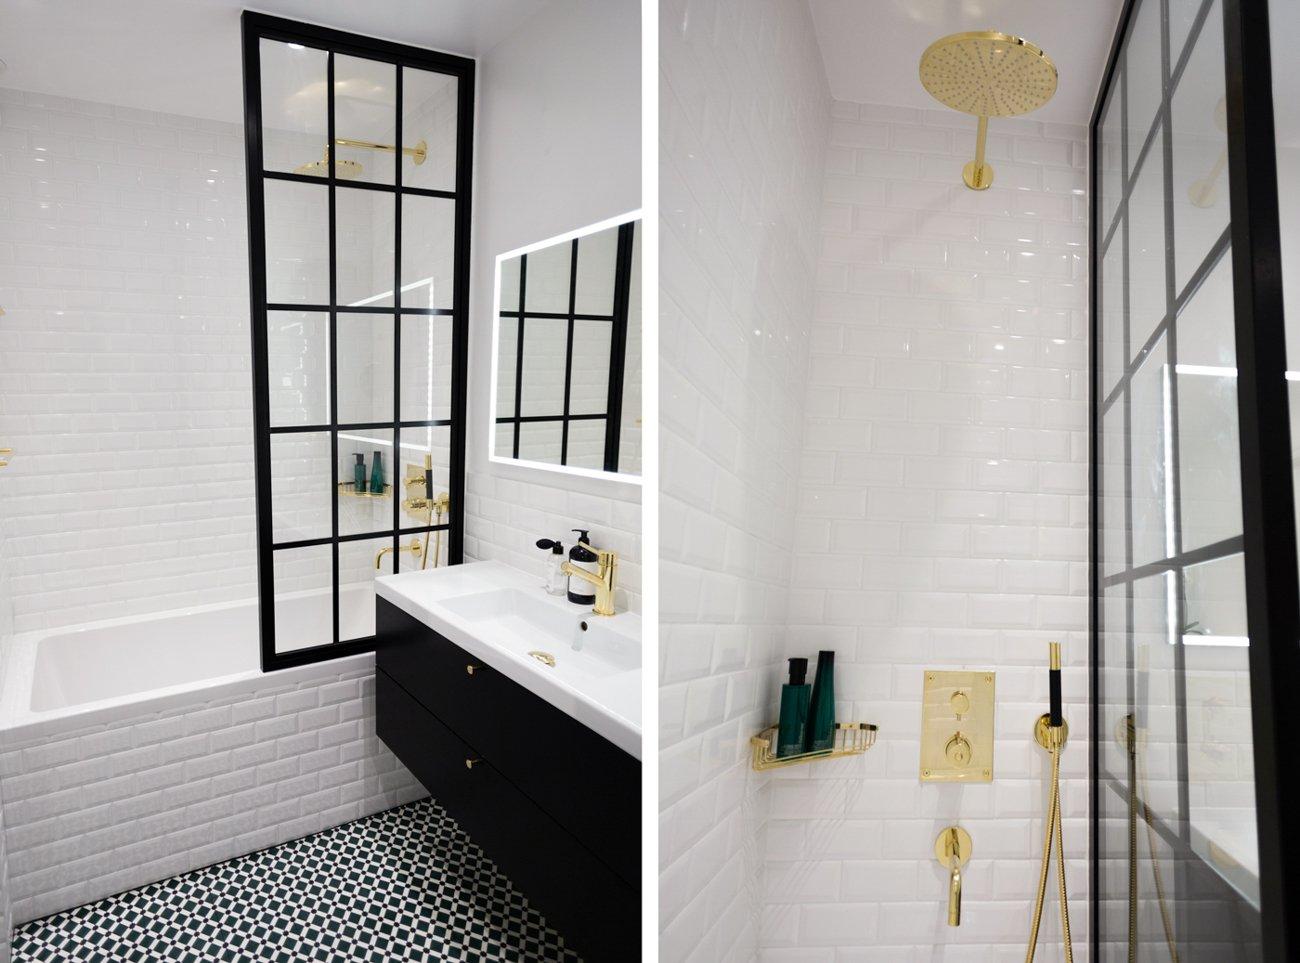 KenzaZouiten_ourbathroom_c-1